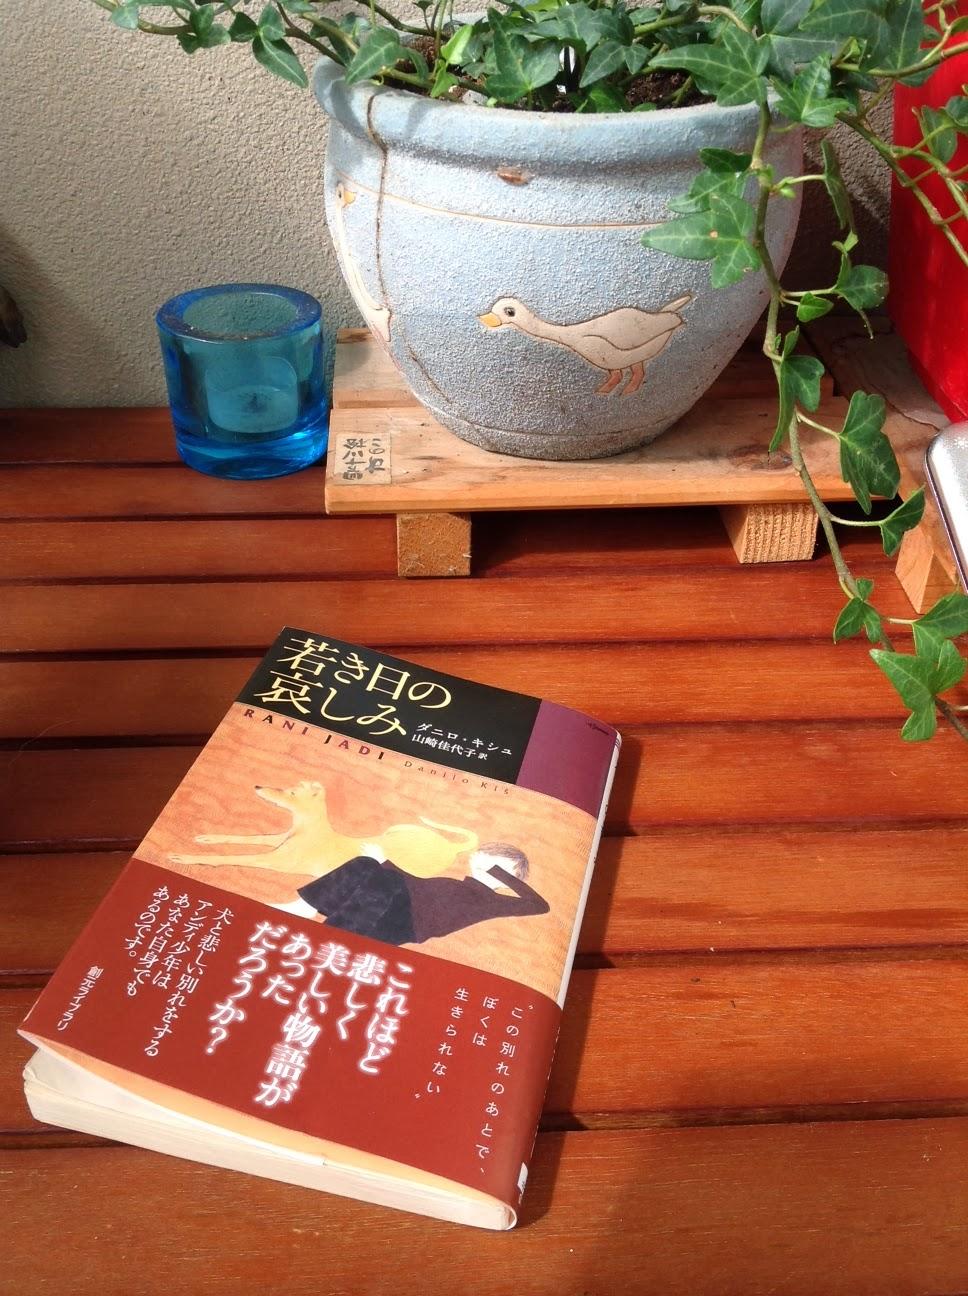 THE MUSIC PLANT 日記: 神本降臨...